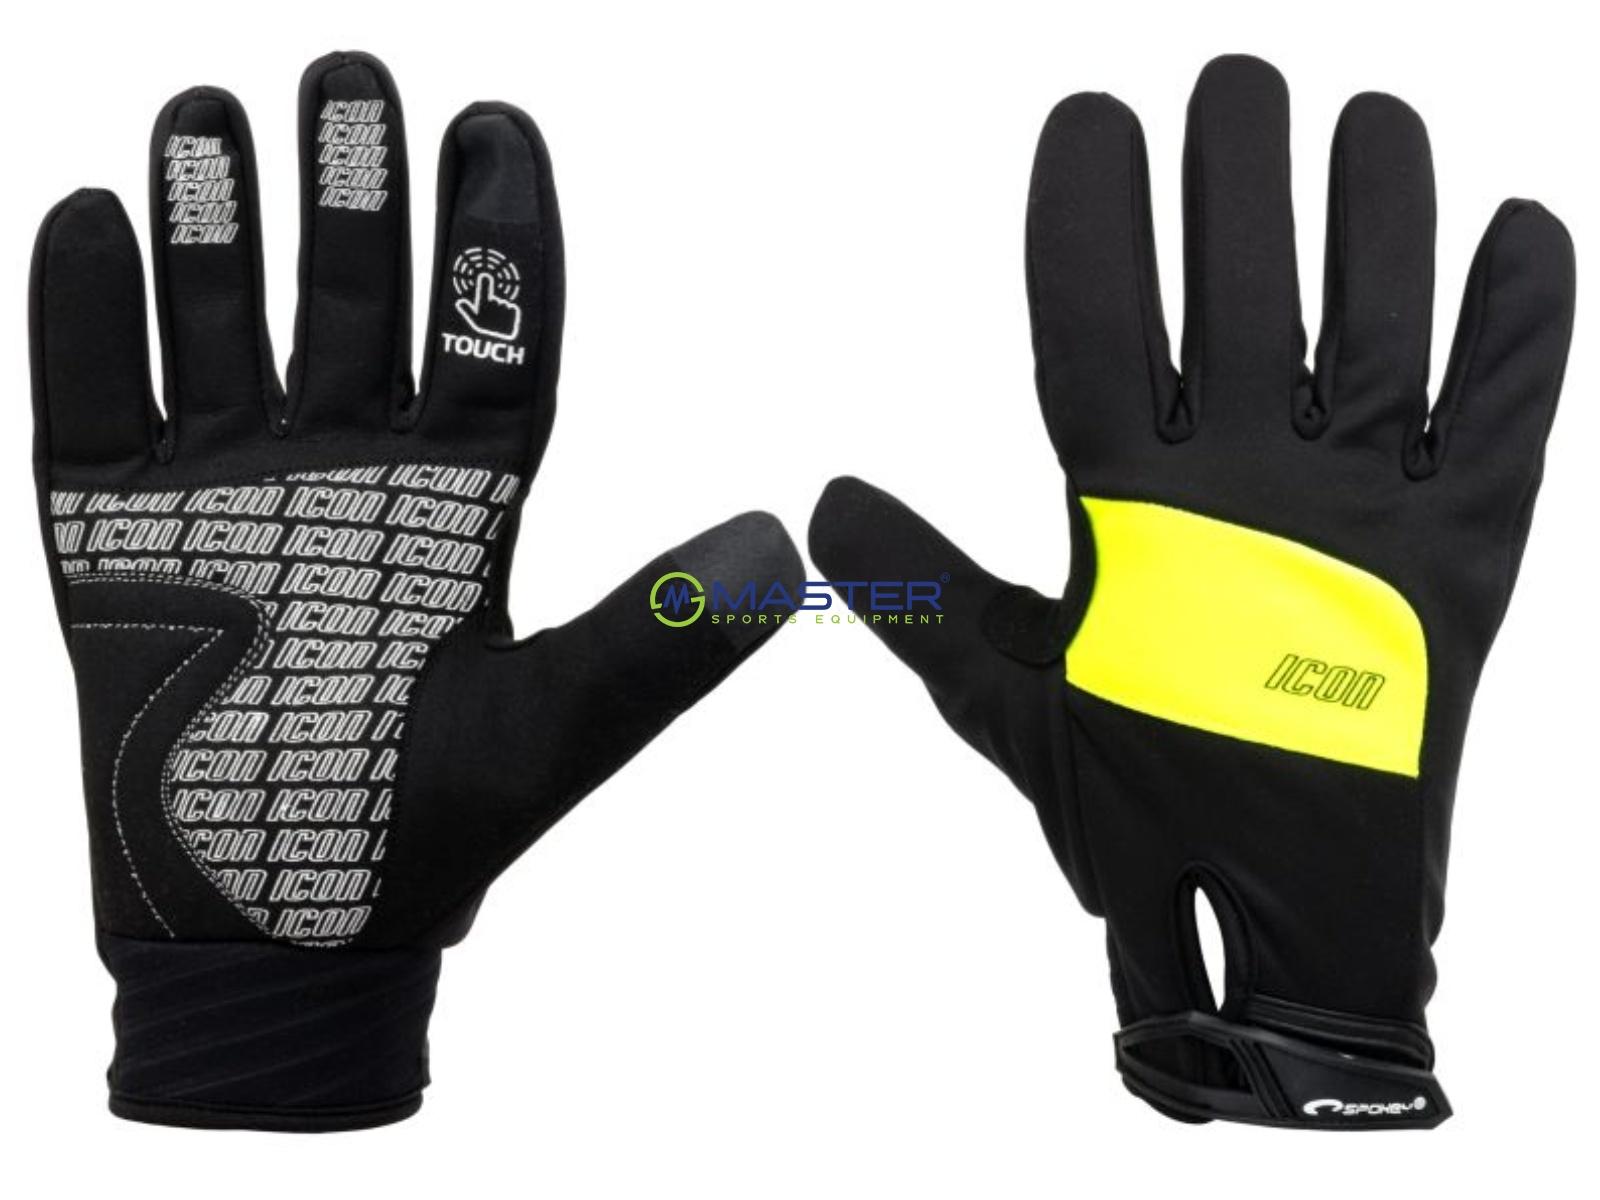 Cyklistické rukavice SPOKEY Icon černo-žluté vel. XL ... 3d312109b0